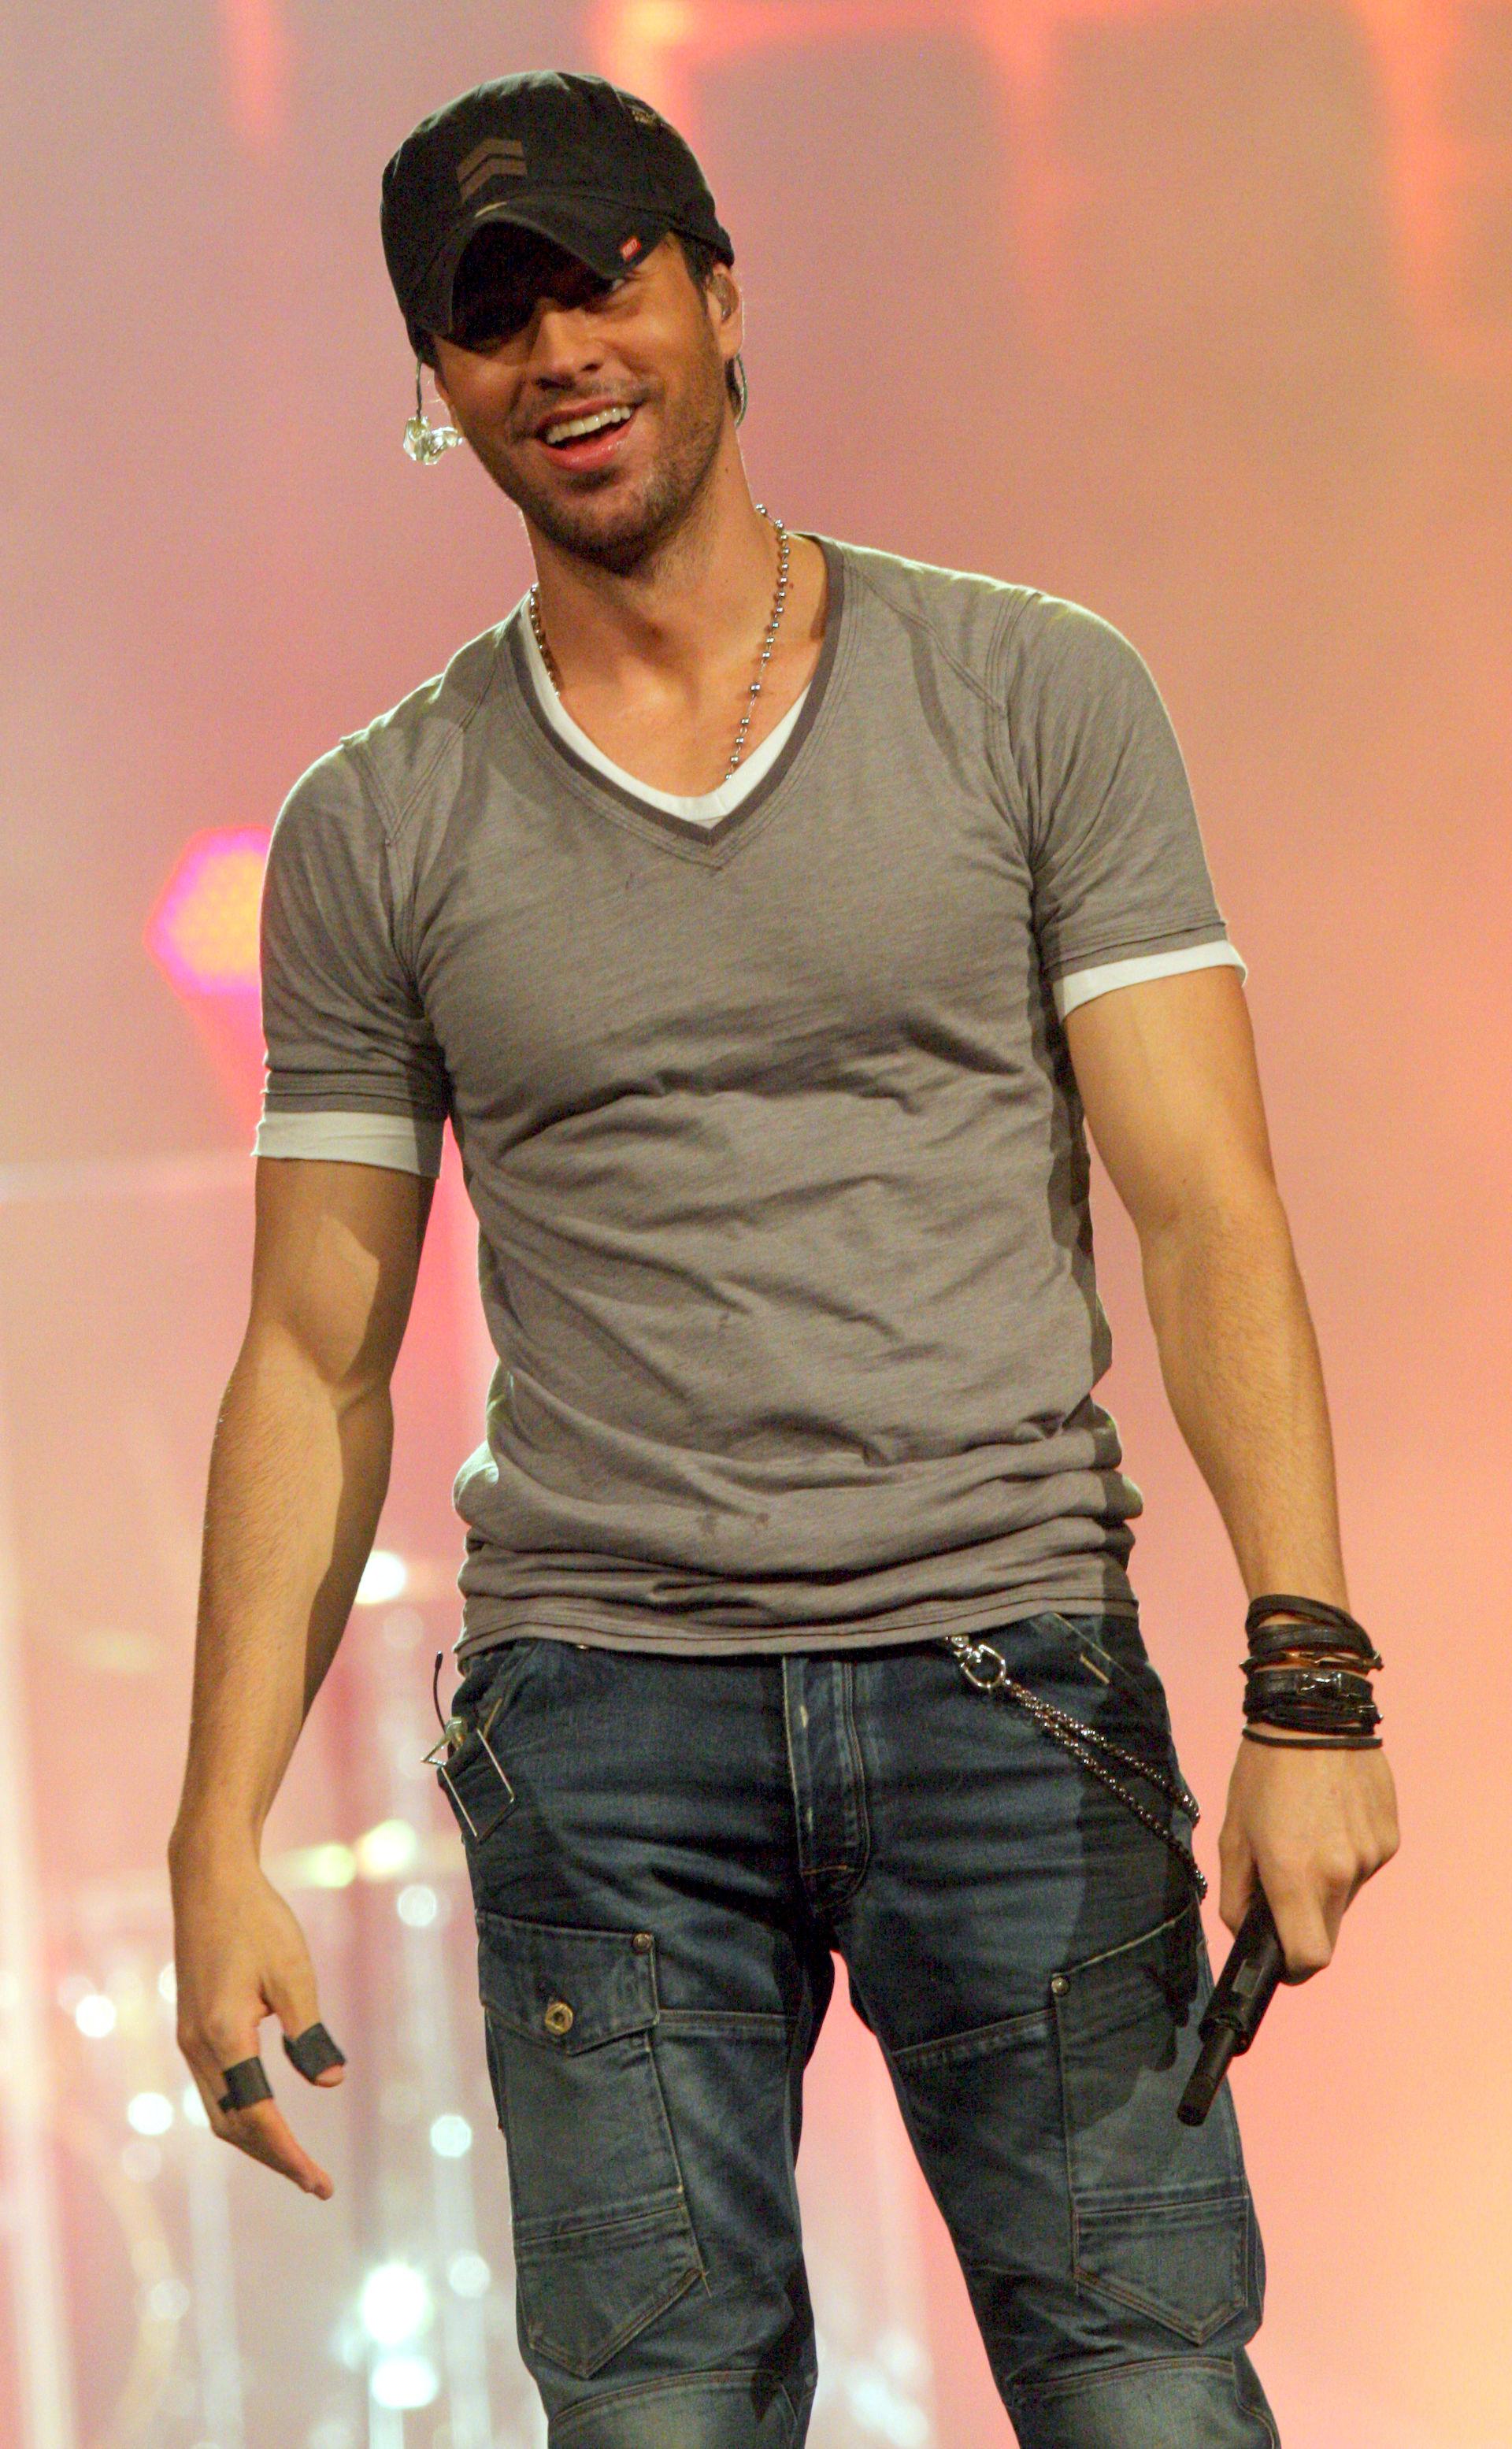 Photo of Enrique Iglesias: Spanish singer-songwriter